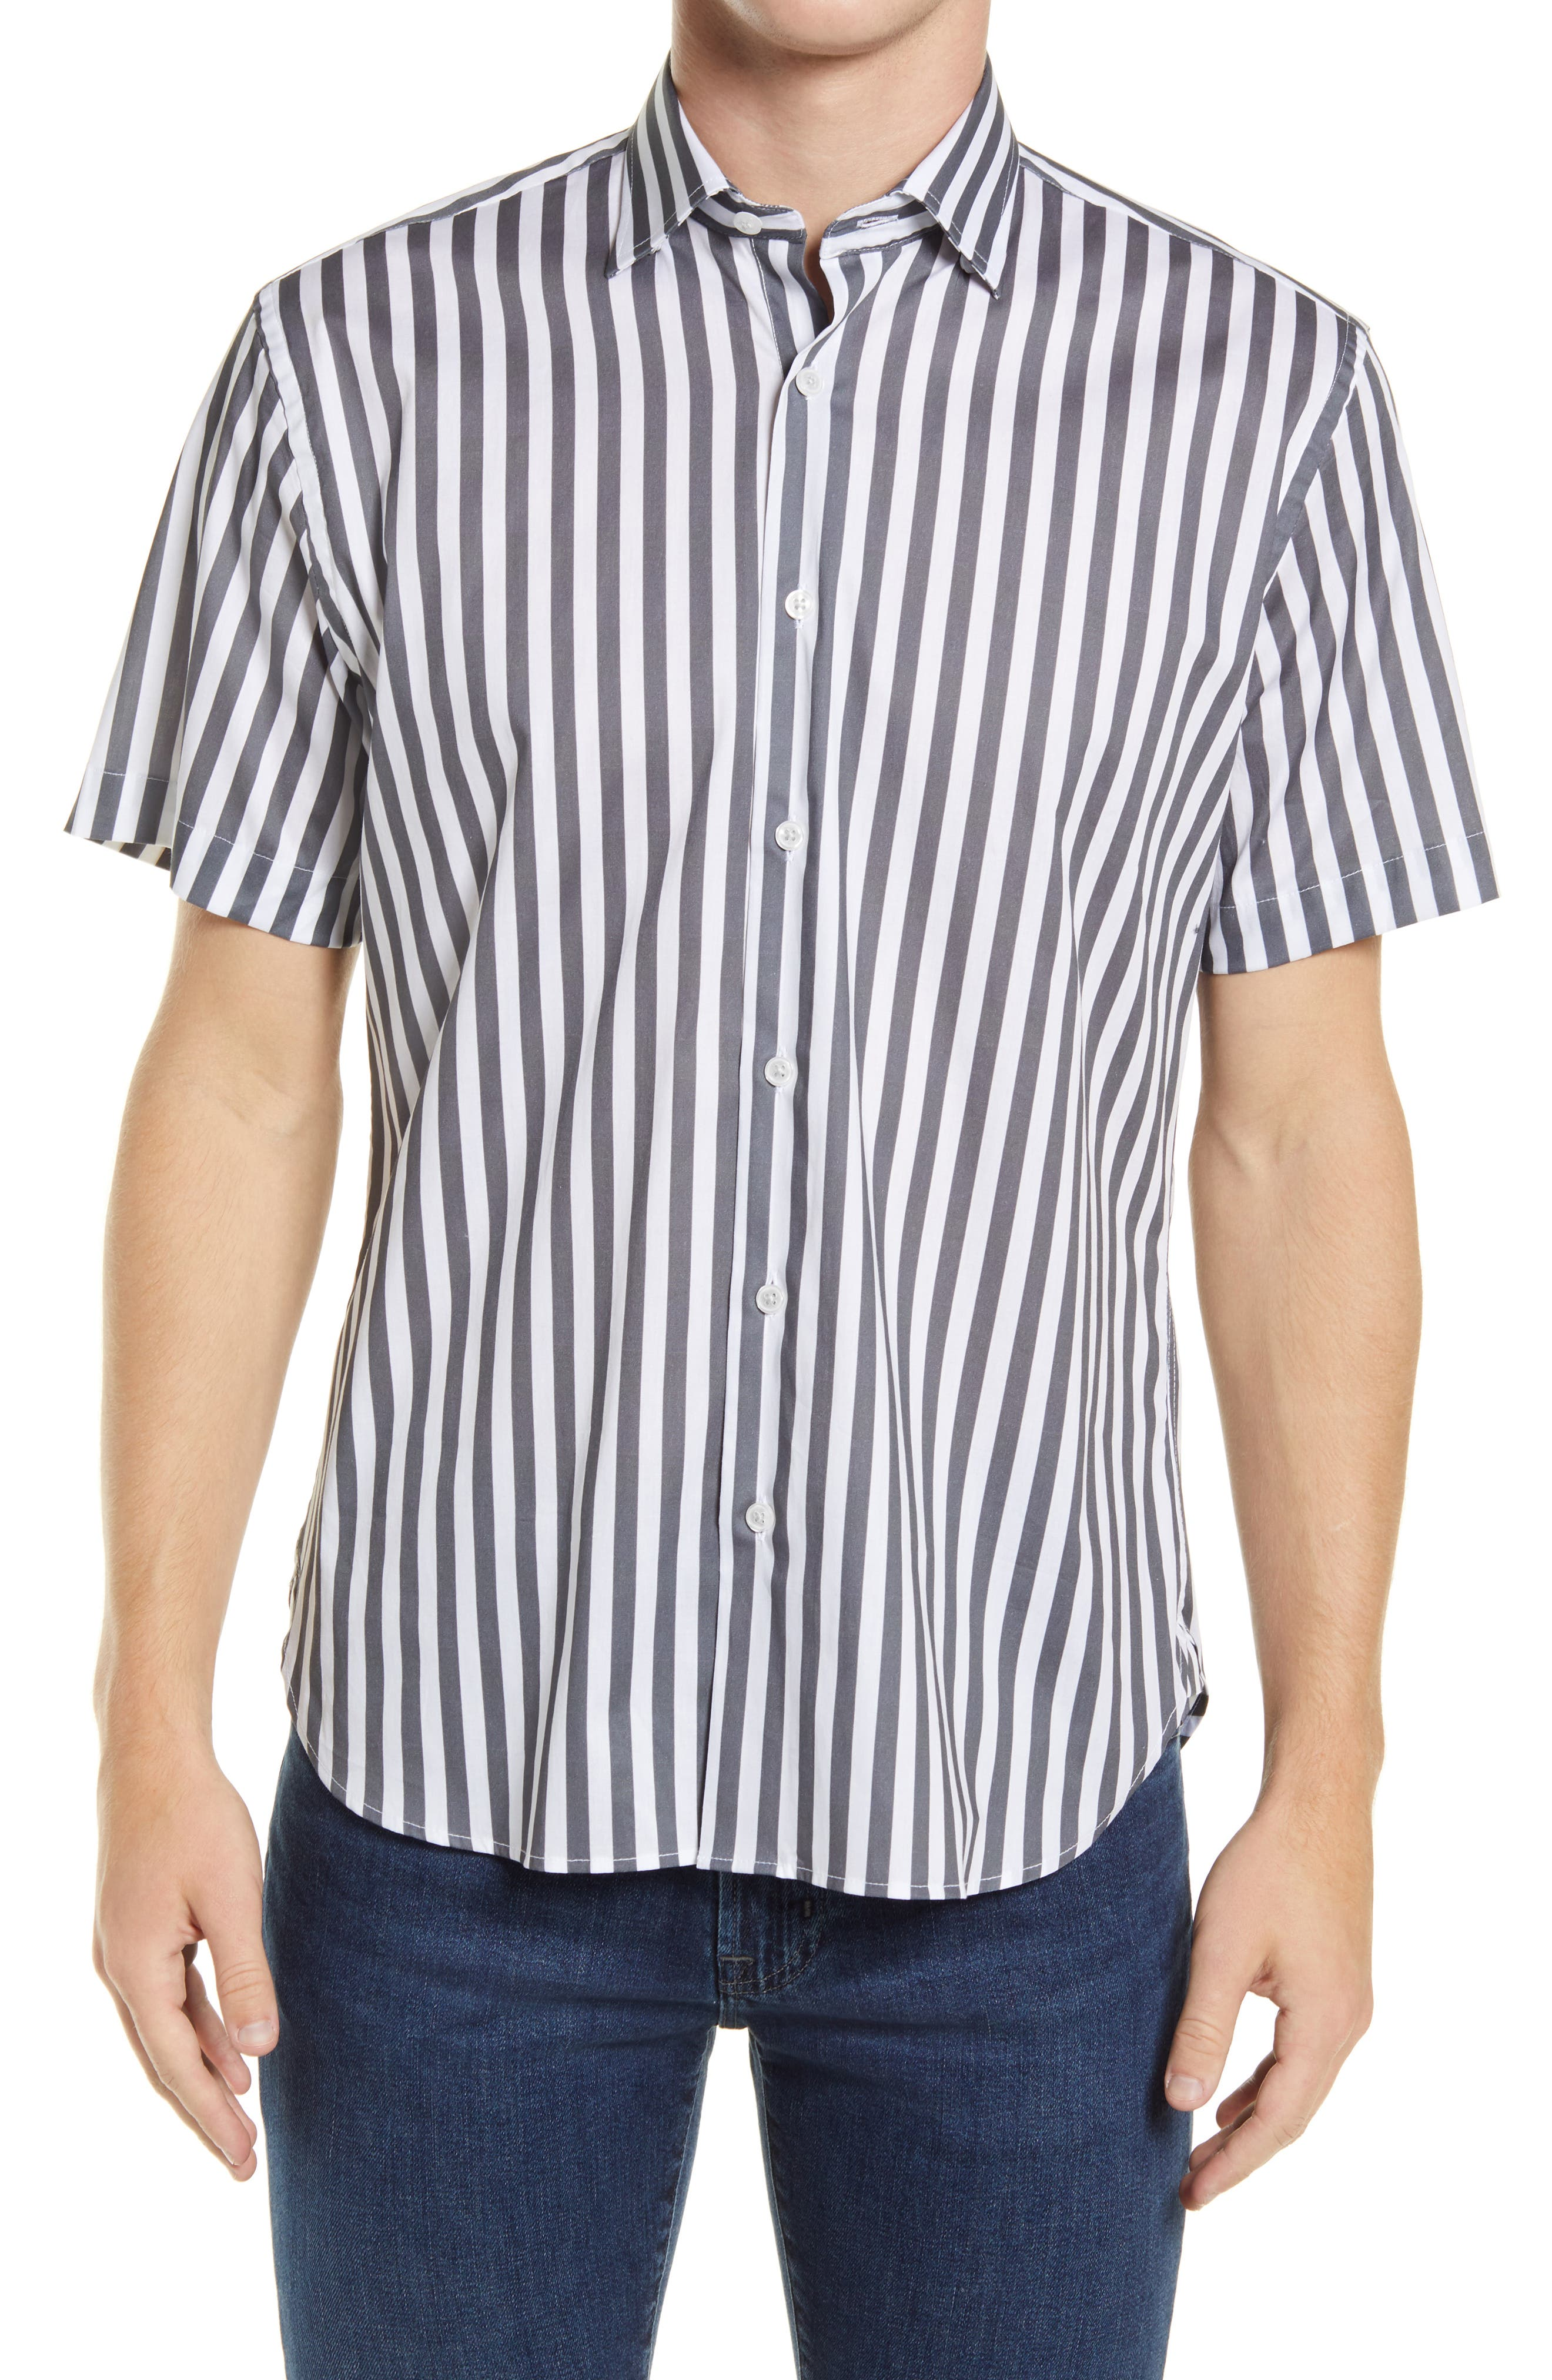 Racetrack Stripe Short Sleeve Stretch Button-Up Shirt